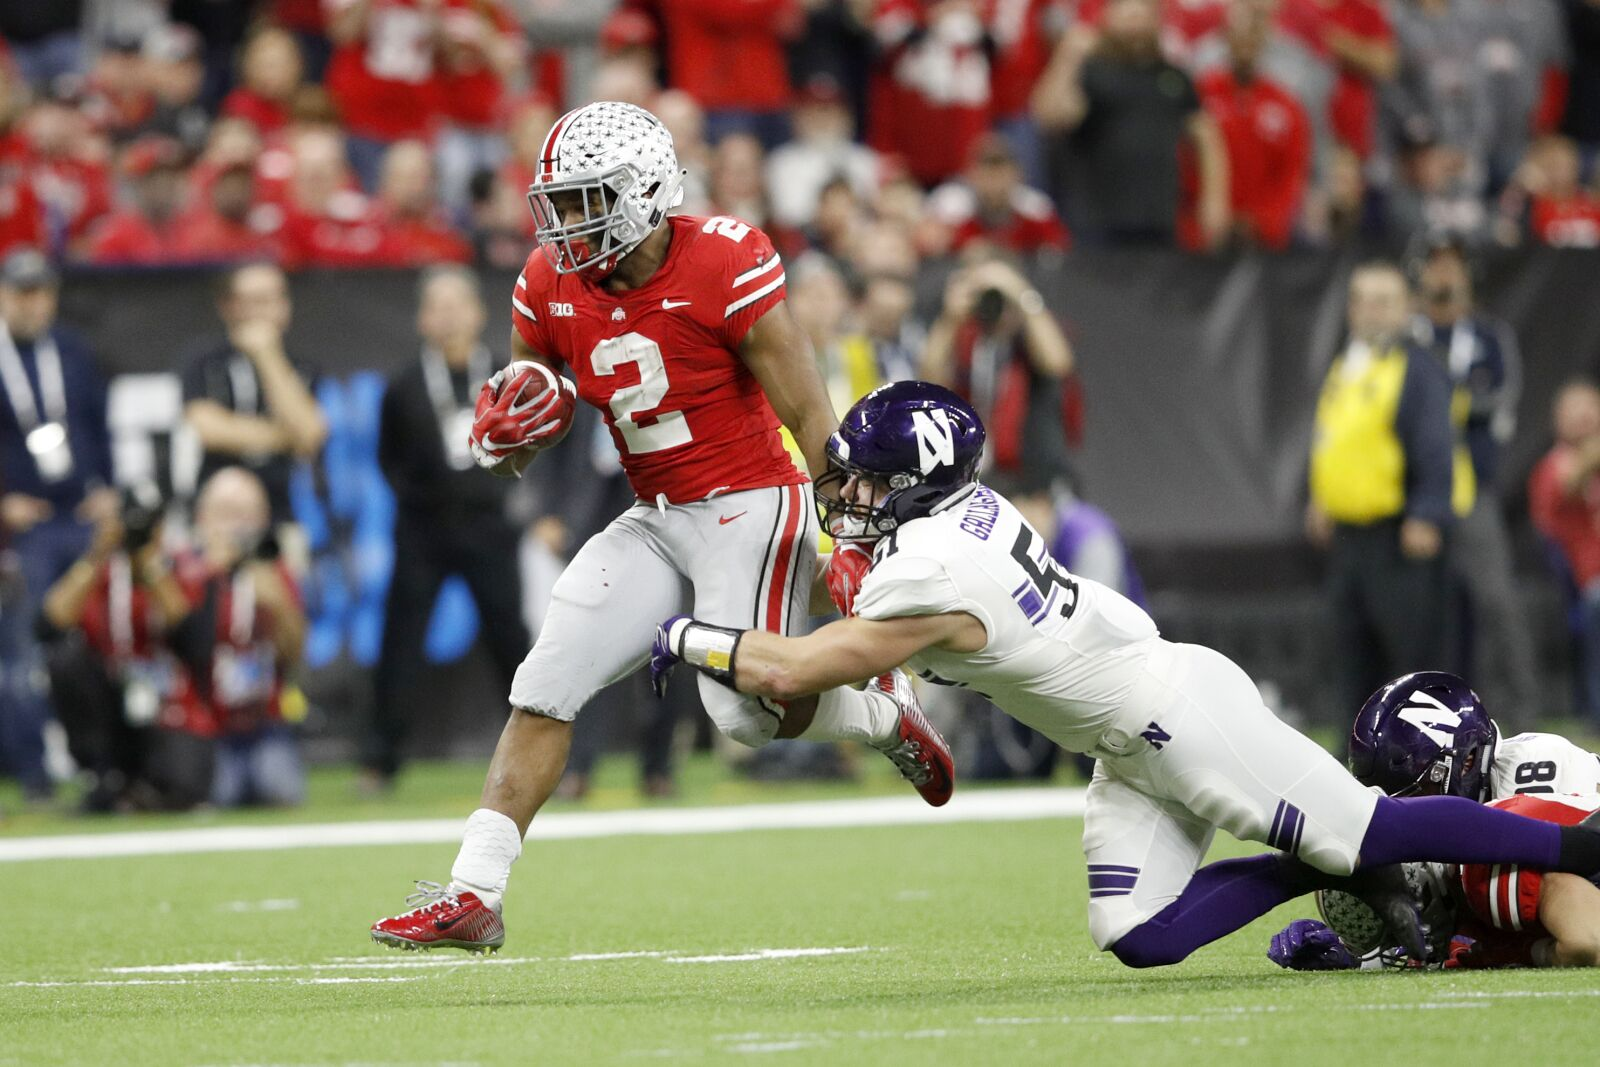 Ohio State Football: Expect Buckeye offense to be balanced like 2014